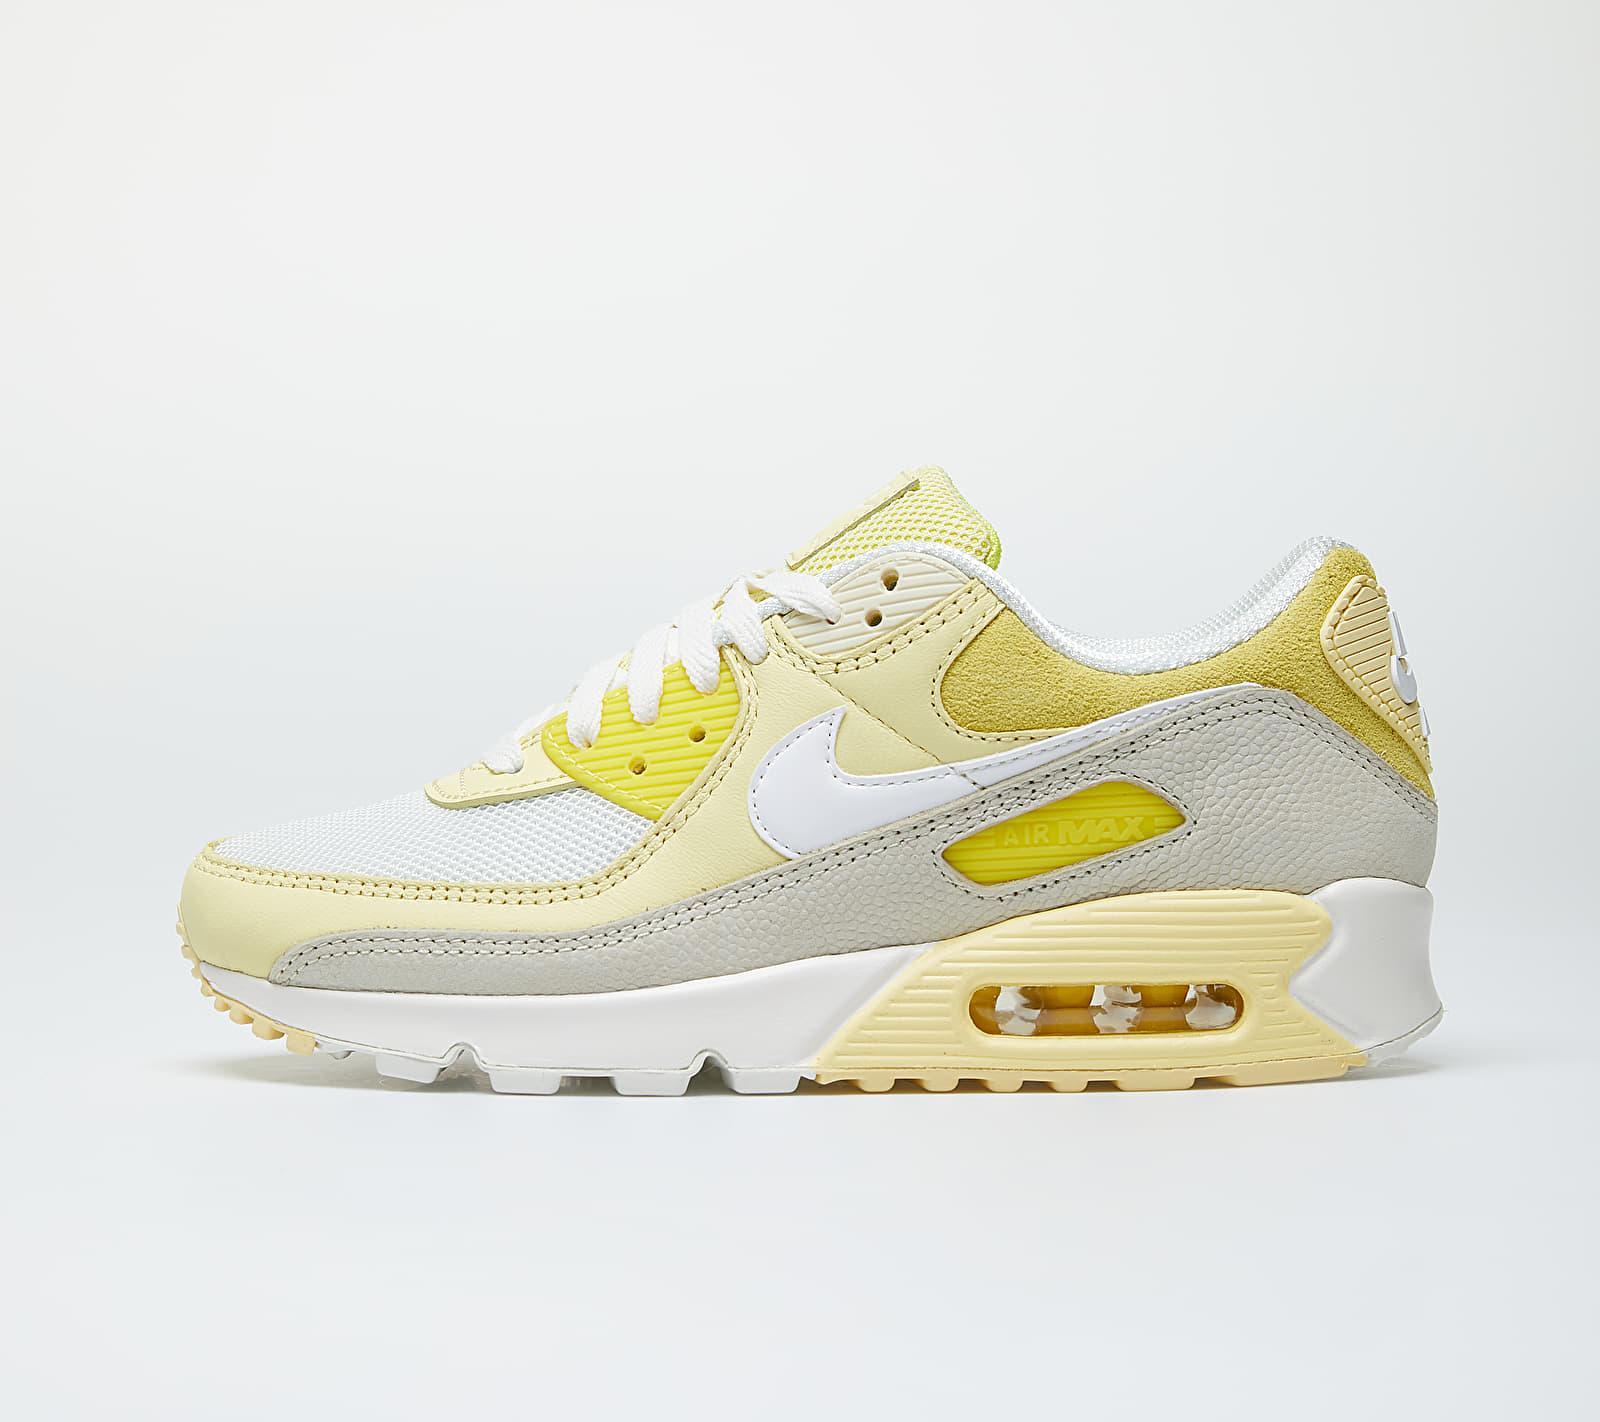 Nike Wmns Air Max 90 Opti Yellow/ White-Fossil-Bicycle Yellow 1